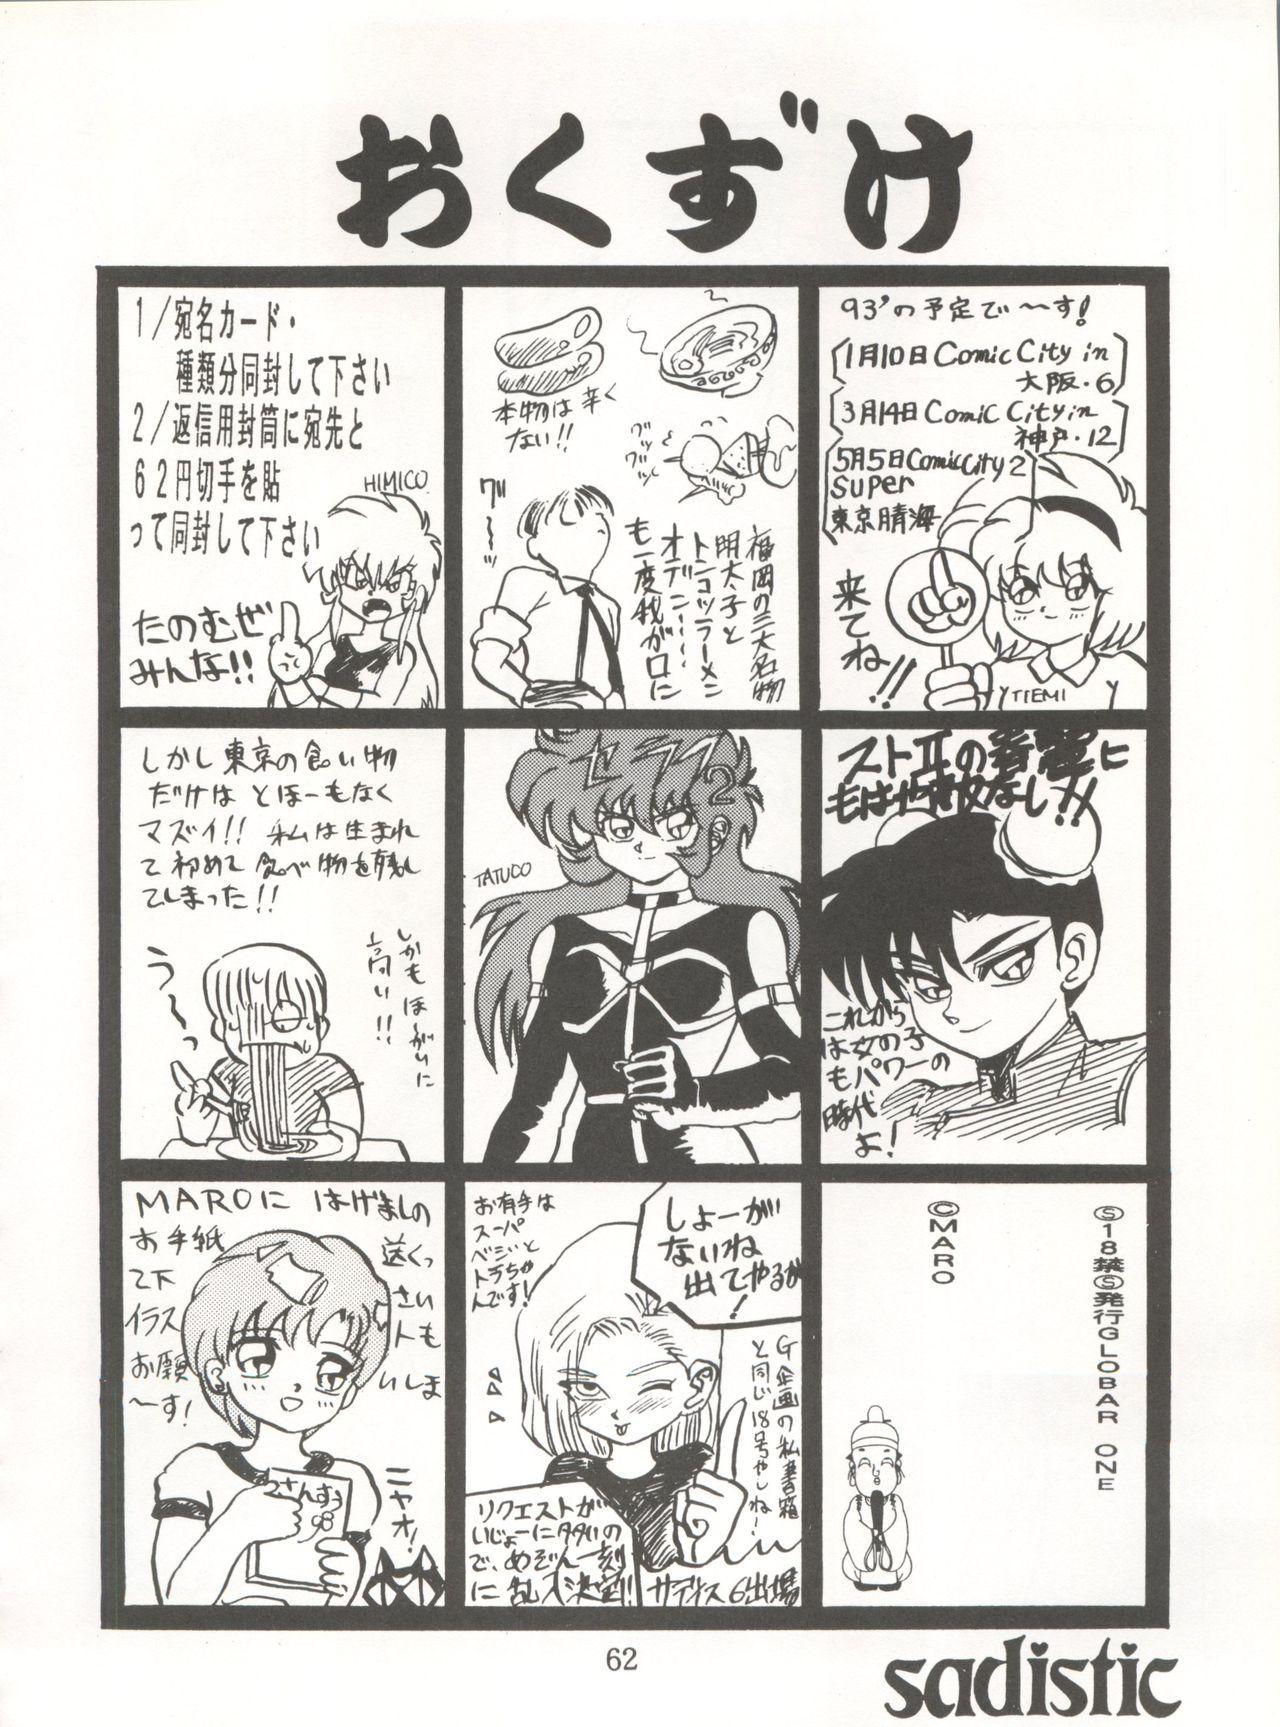 [Global One (MARO)] Sadistic 5 (Cutey Honey, Devilman, Sailor Moon), [Global One (MARO)] Sadistic (Dirty Pair, Fushigi no Umi no Nadia, Sailor Moon), [Studio Ikkatsumajin] .ribbon (Hime-chan's Ribbon) 61